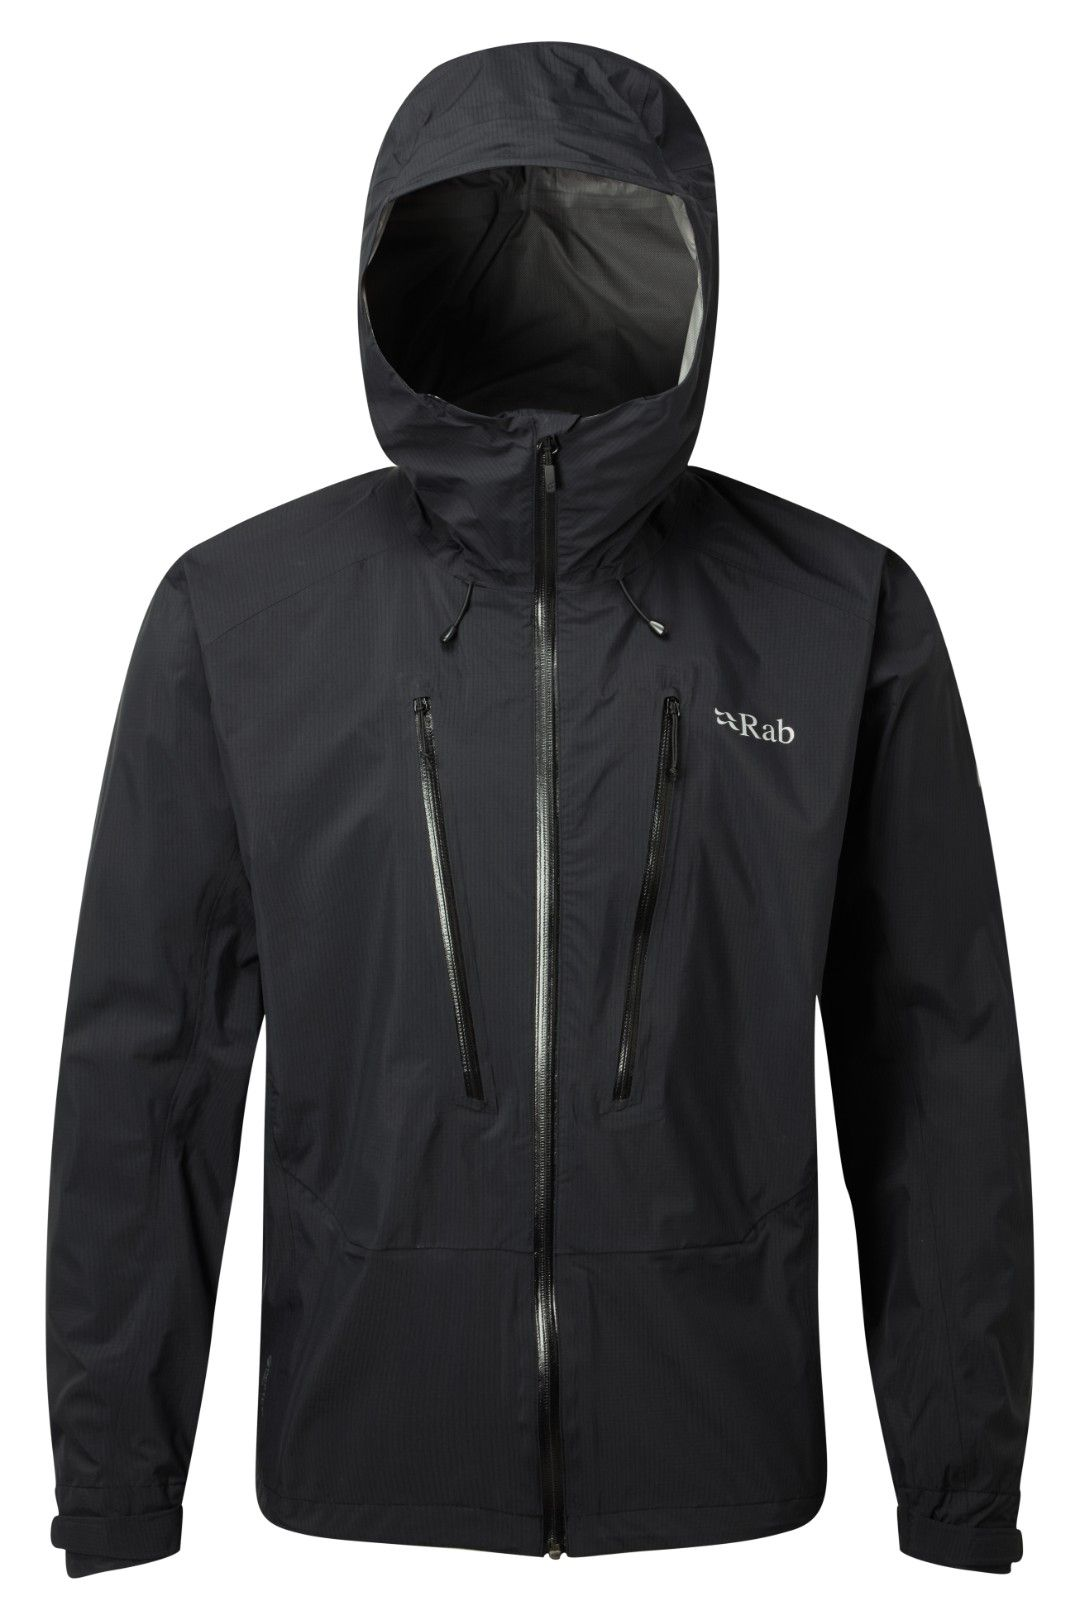 Rab Downpour Alpine Jacket - Hardshell jacket - Men's